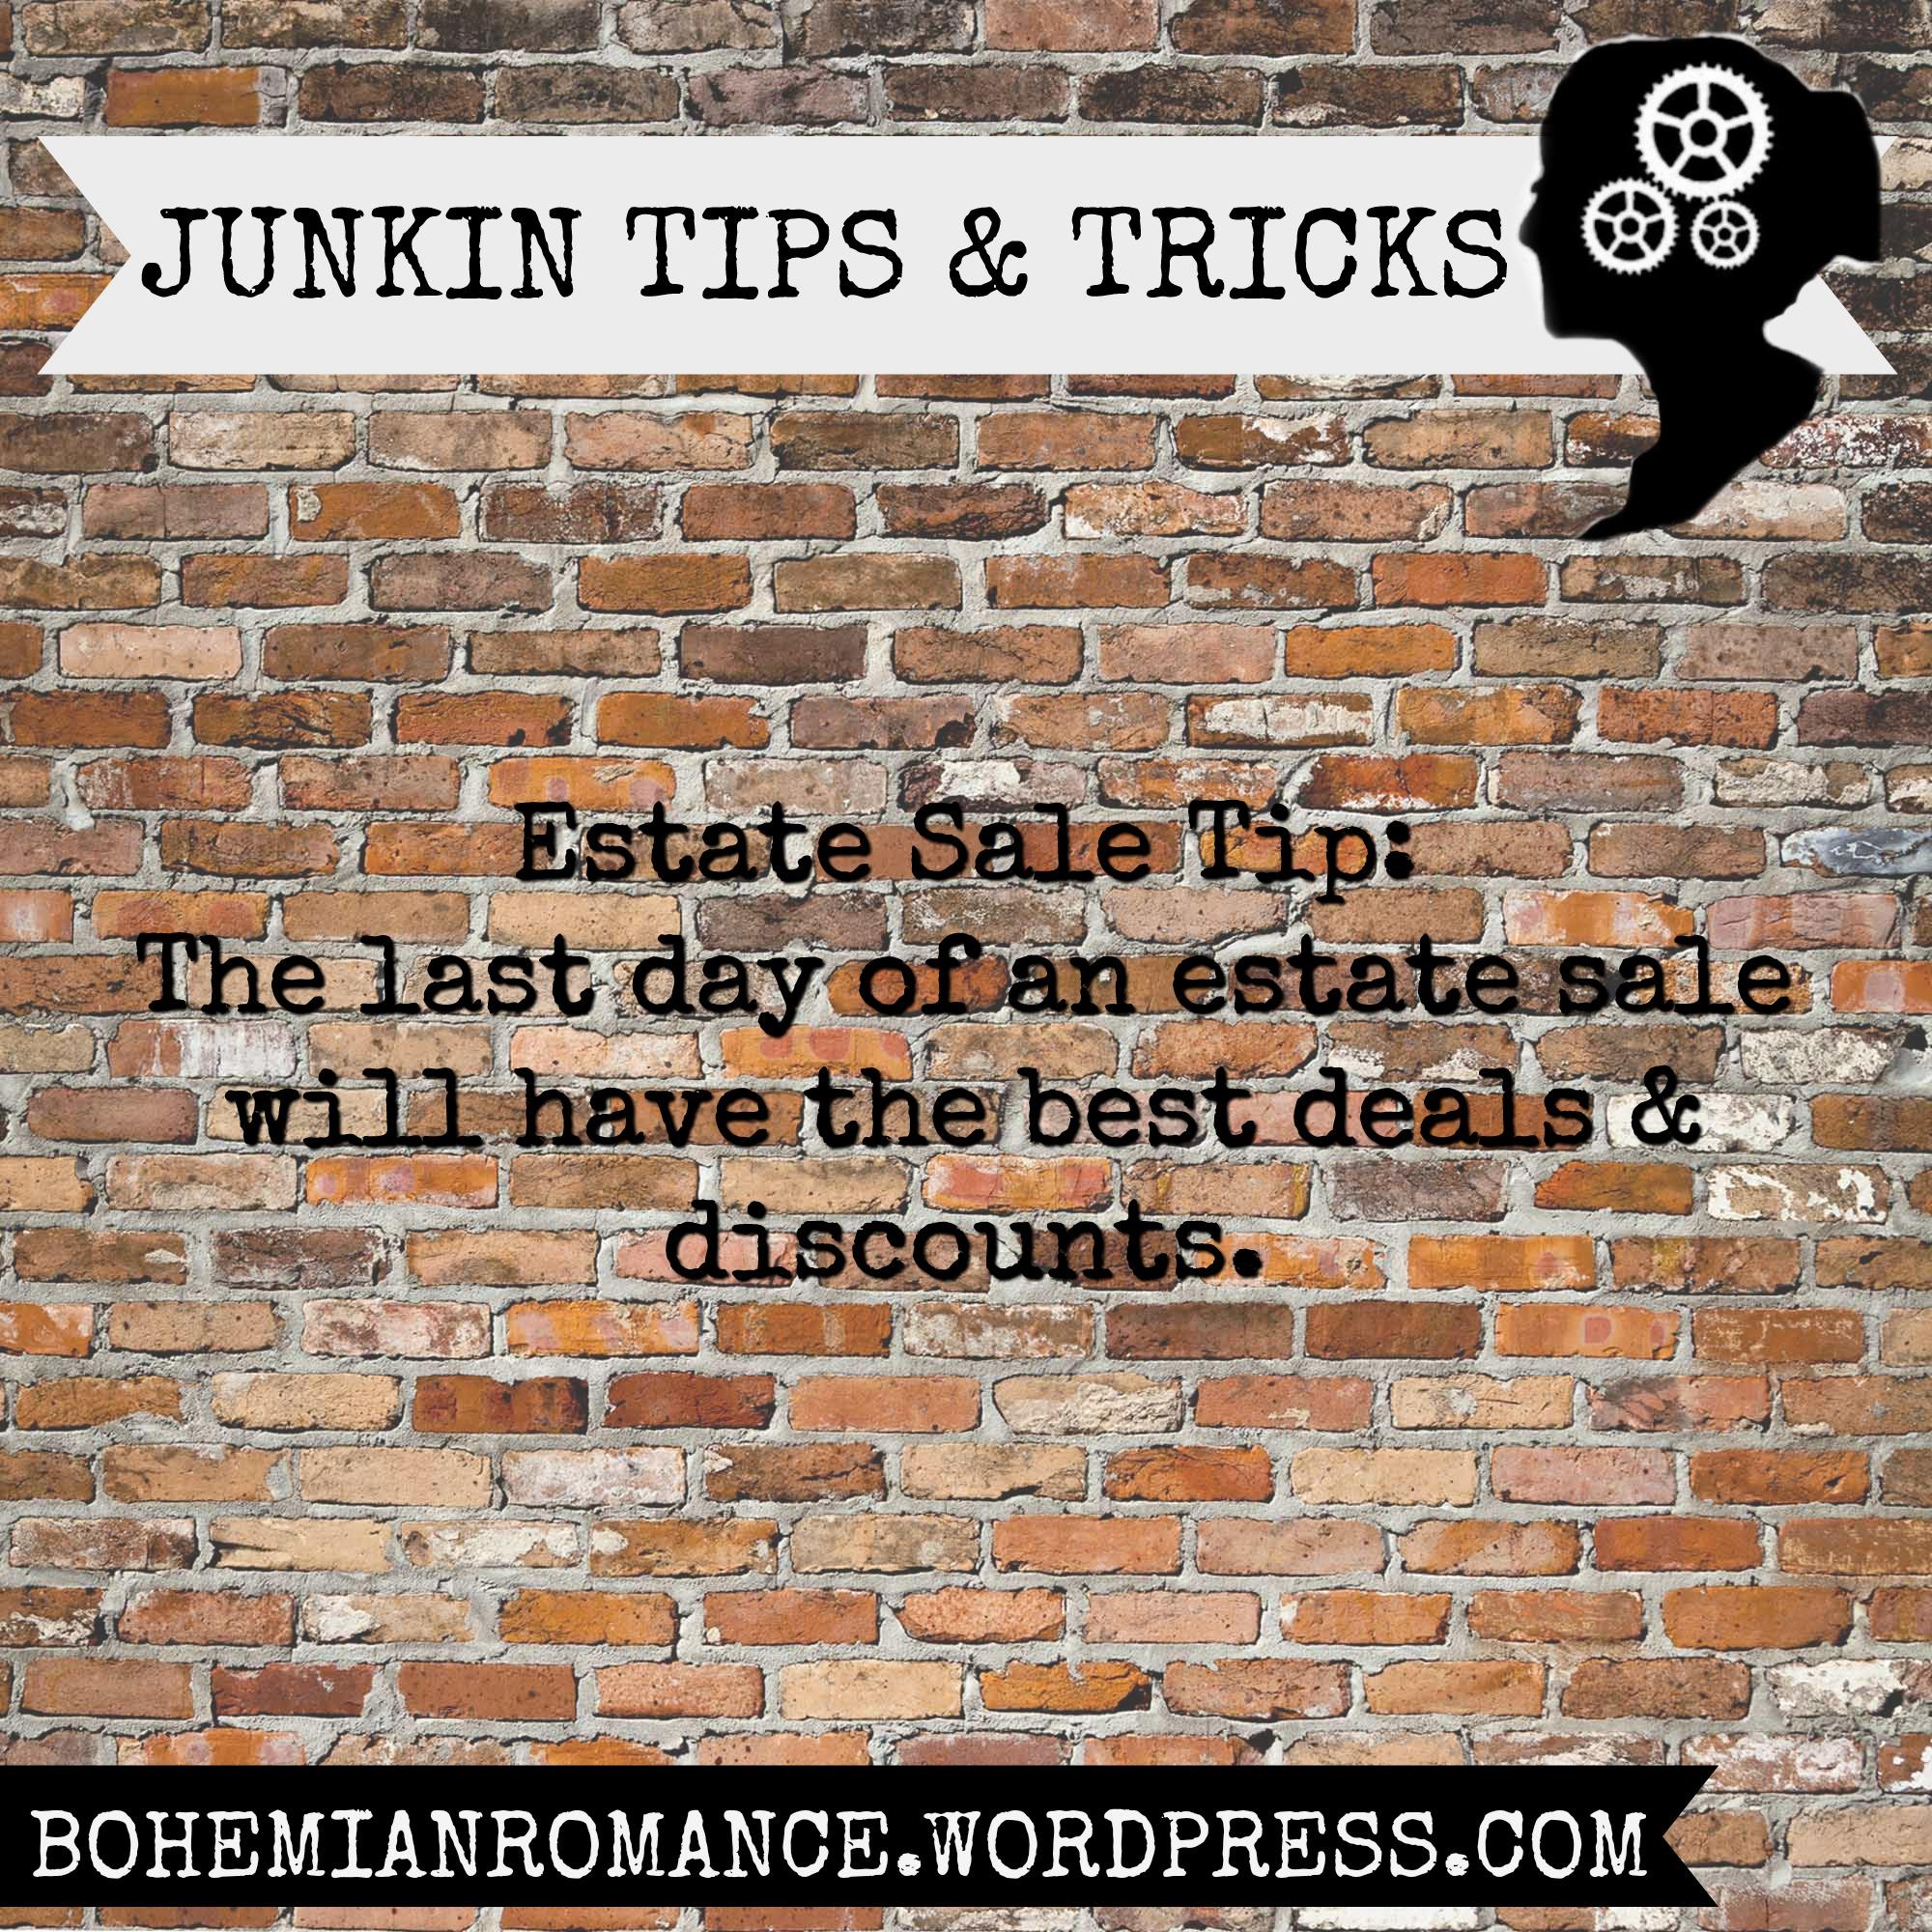 8-junkin-tips-tricks-template